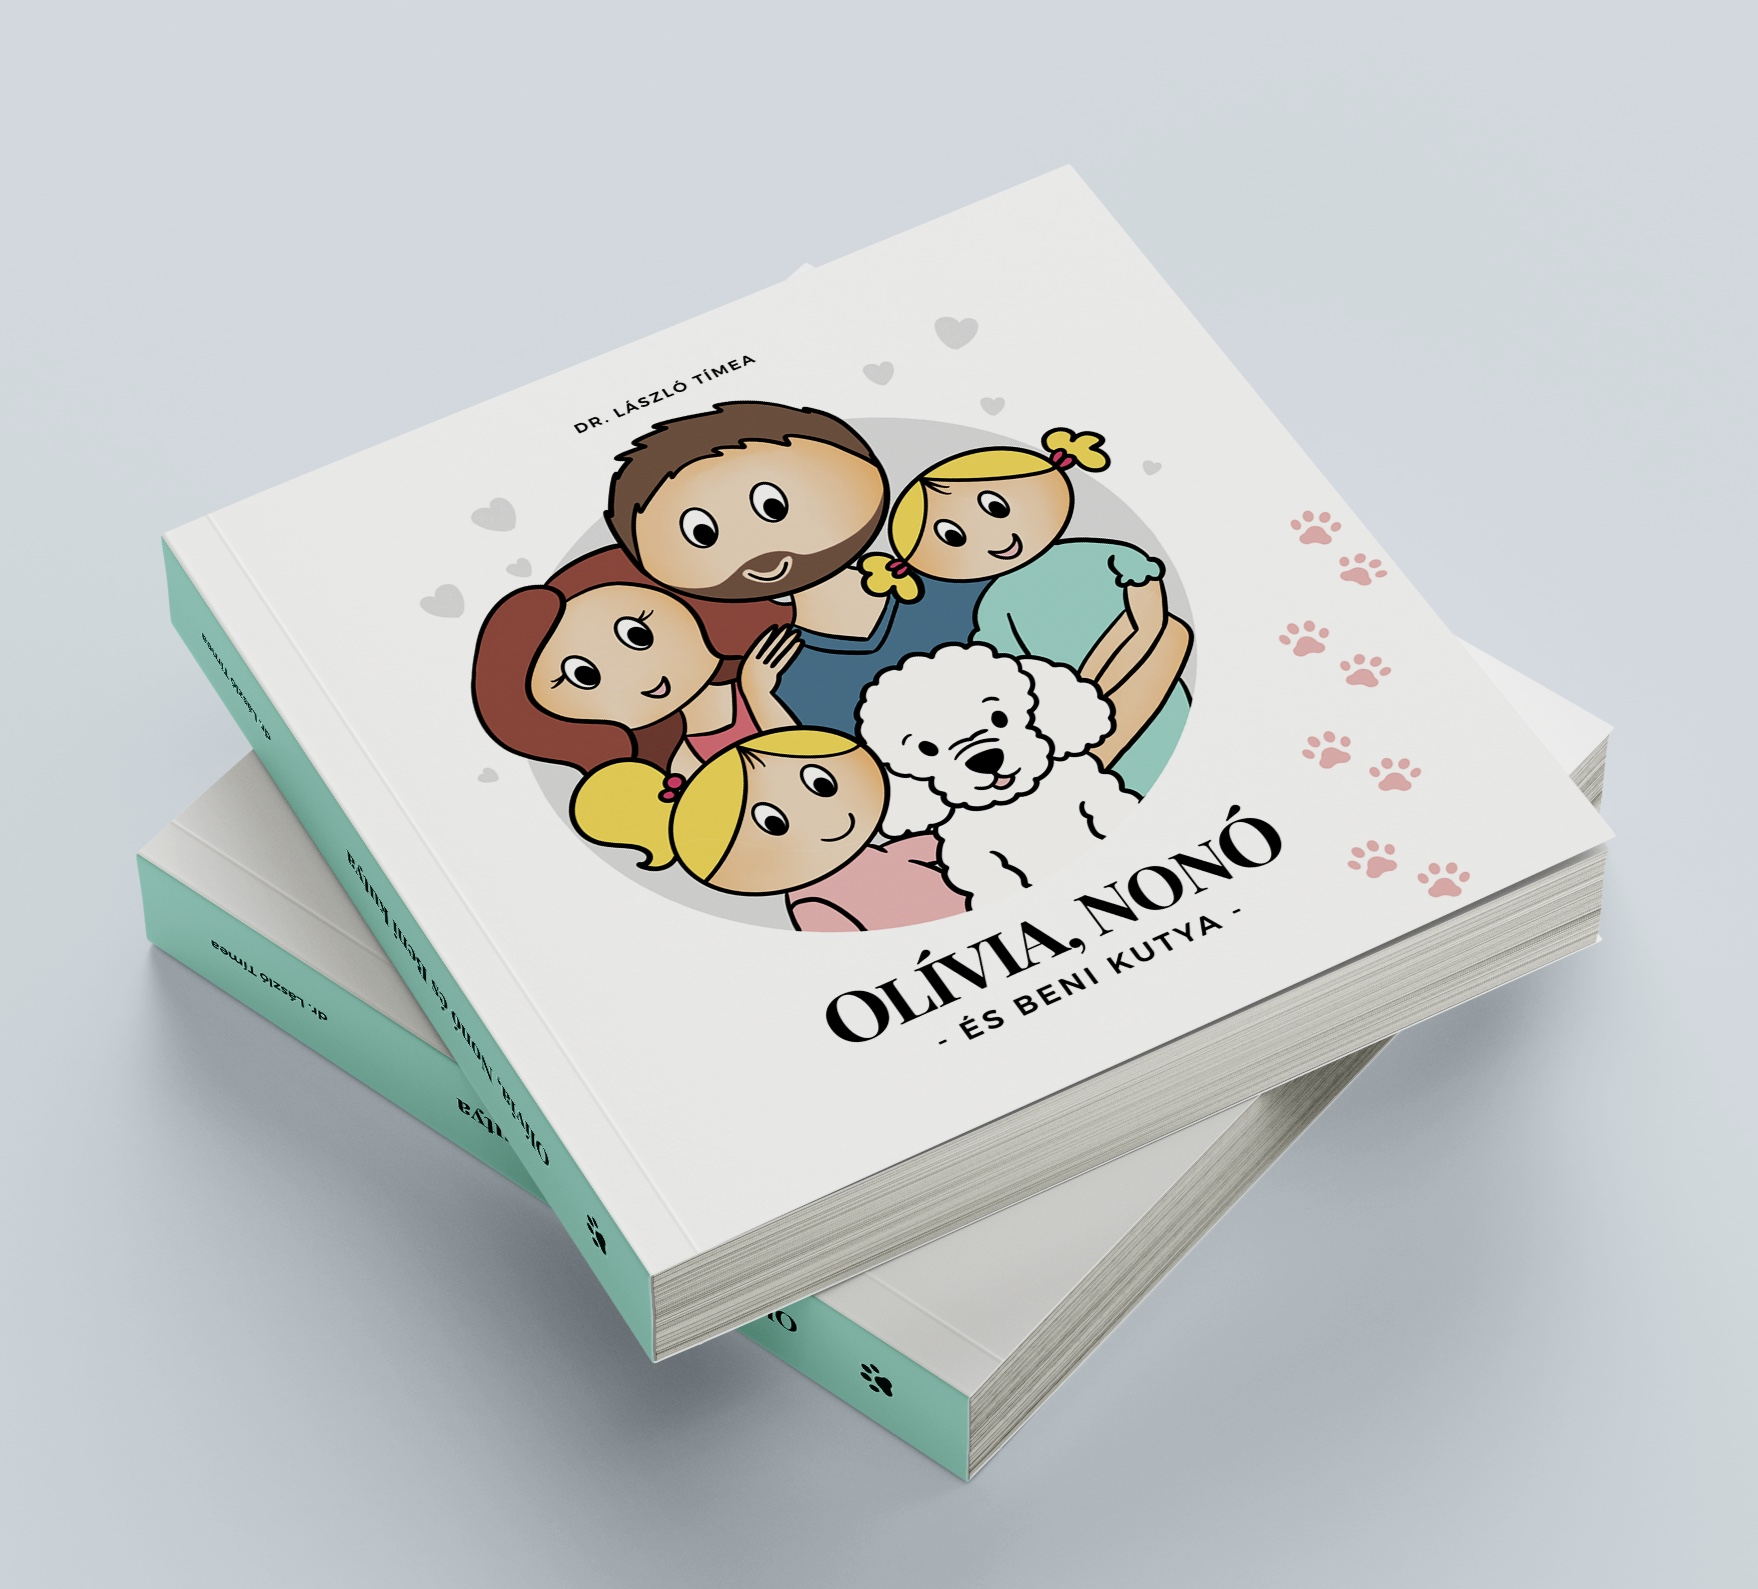 Olívia, Nonó és Beni kutya Book Cover